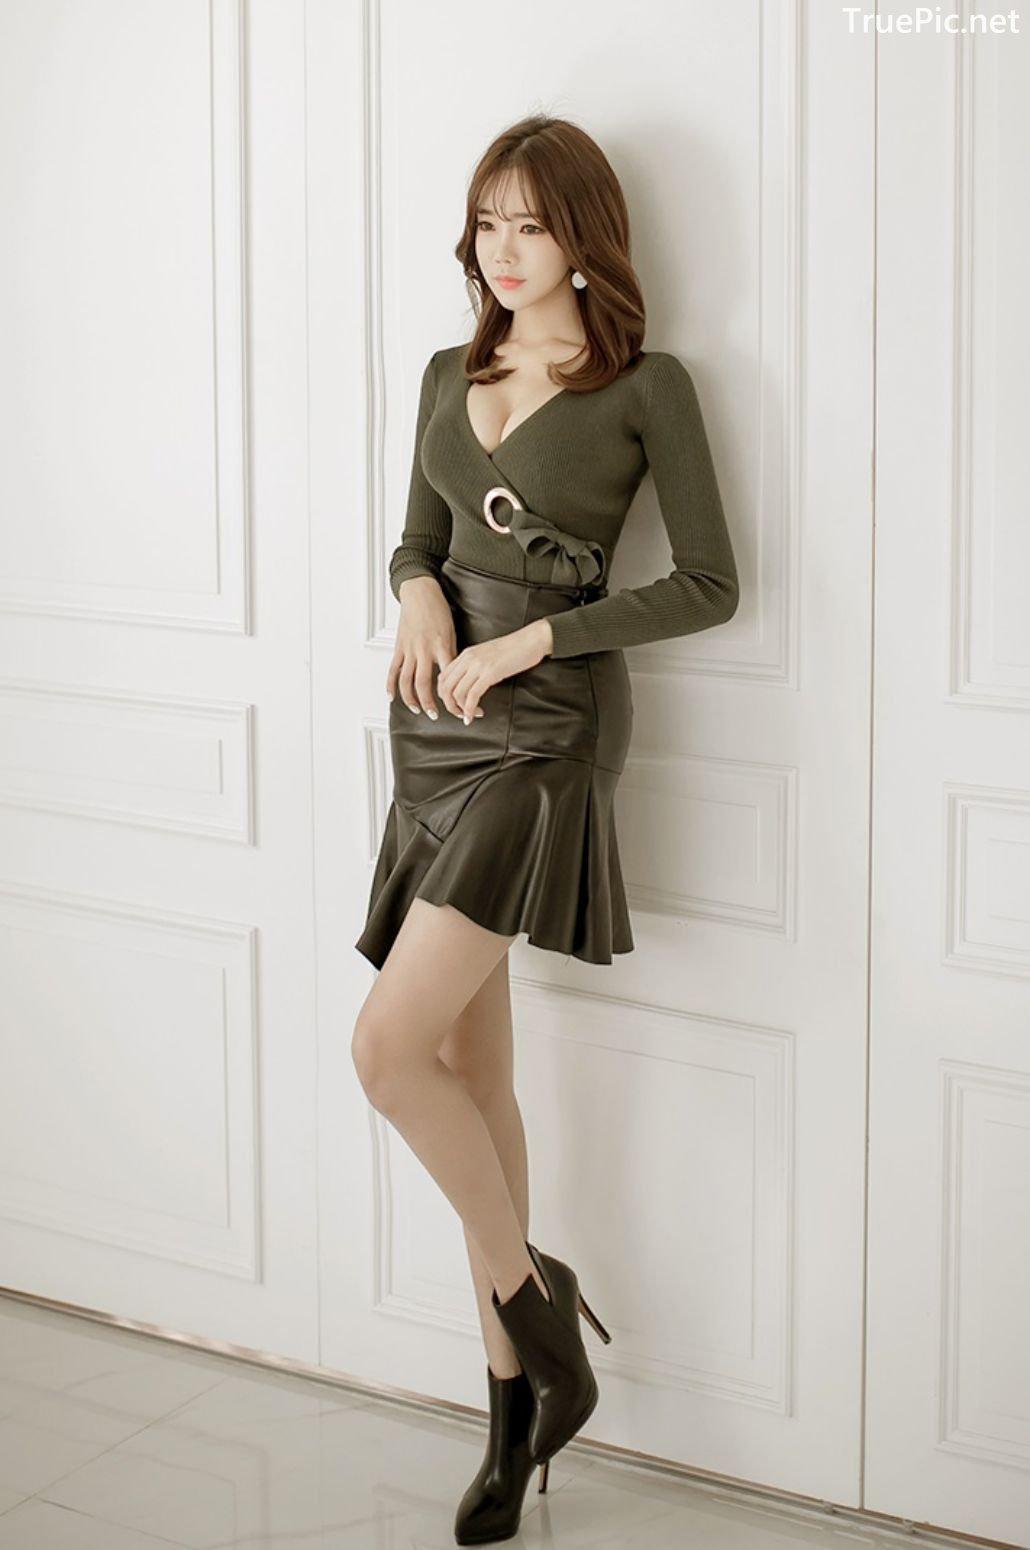 Image-Korean-Fashion-Model–Kang-Eun-Wook–Indoor-Photoshoot-Collection-2-TruePic.net- Picture-8